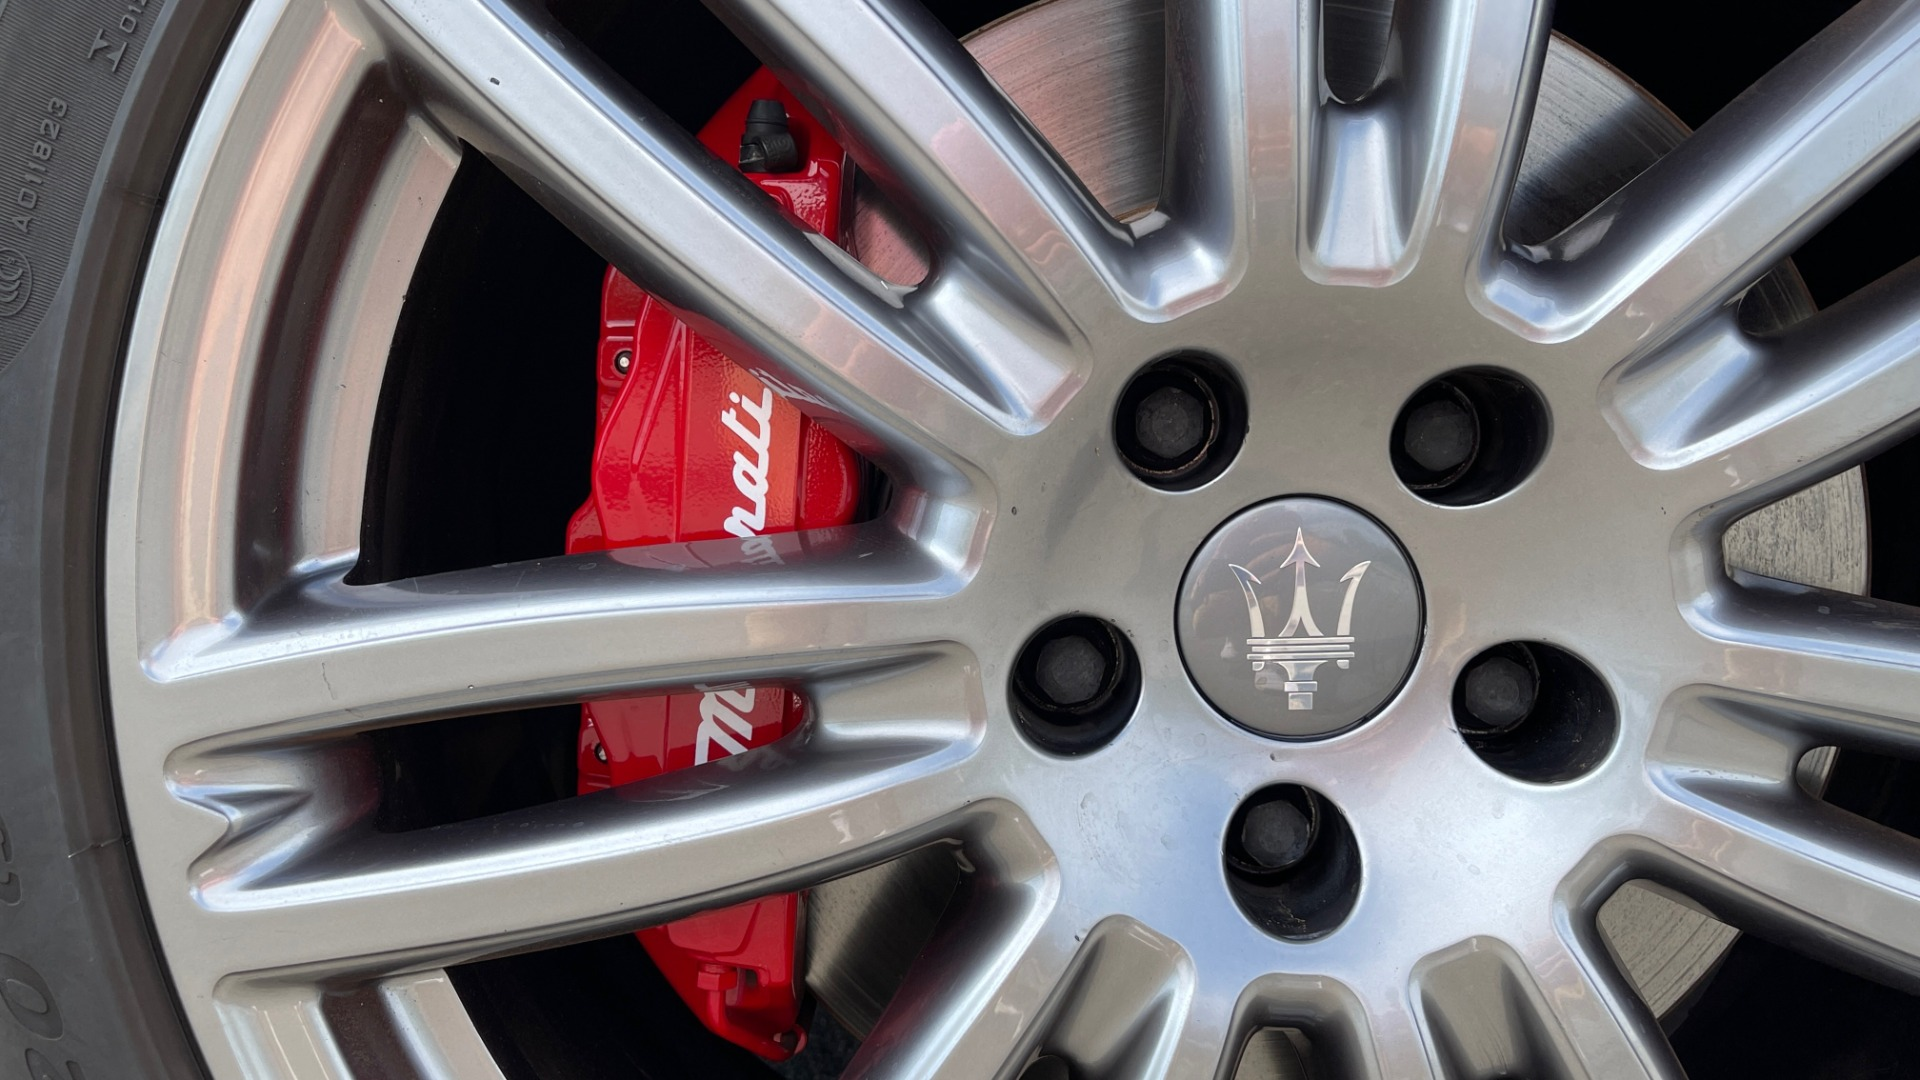 Used 2018 Maserati GHIBLI 3.0L SEDAN / 8-SPD AUTO / NAV / SUNROOF / REARVIEW for sale $42,995 at Formula Imports in Charlotte NC 28227 8